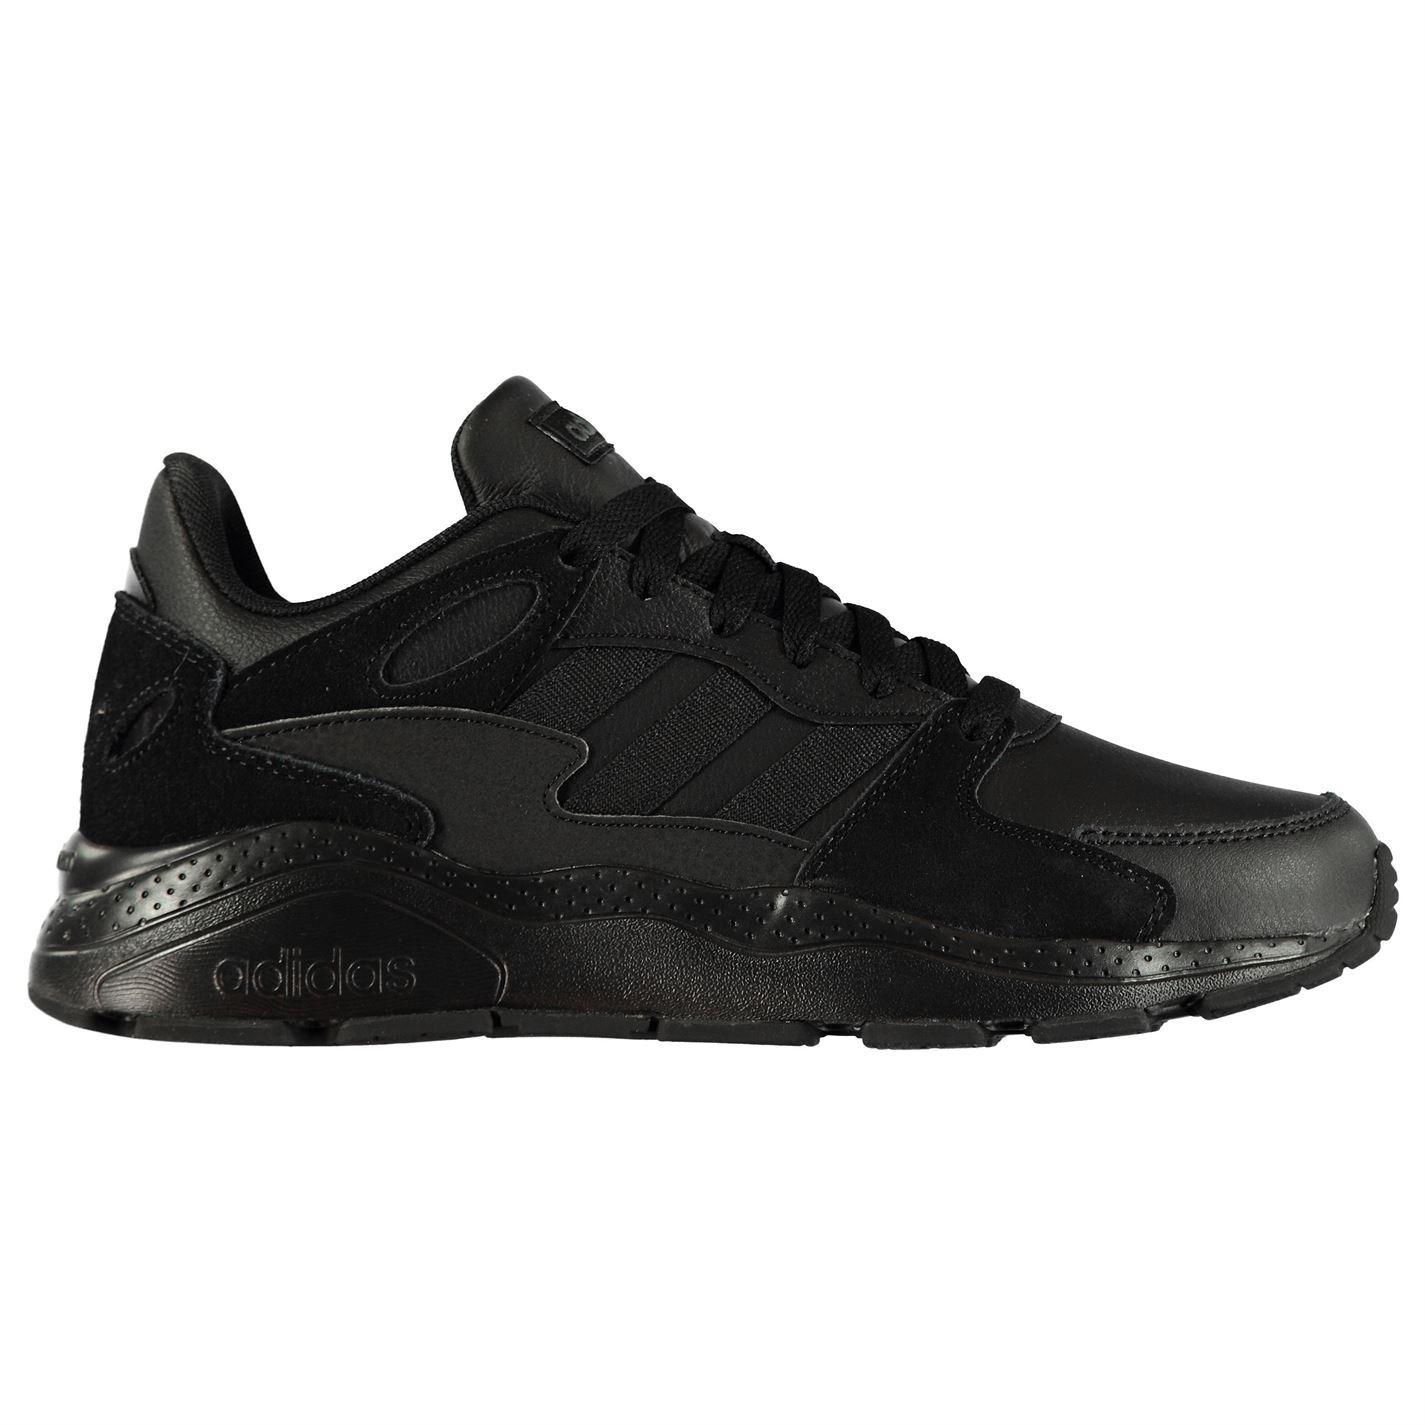 Adidas-Crazychaos-Baskets-Homme-Chaussures-De-Loisirs-Chaussures-Baskets miniature 3